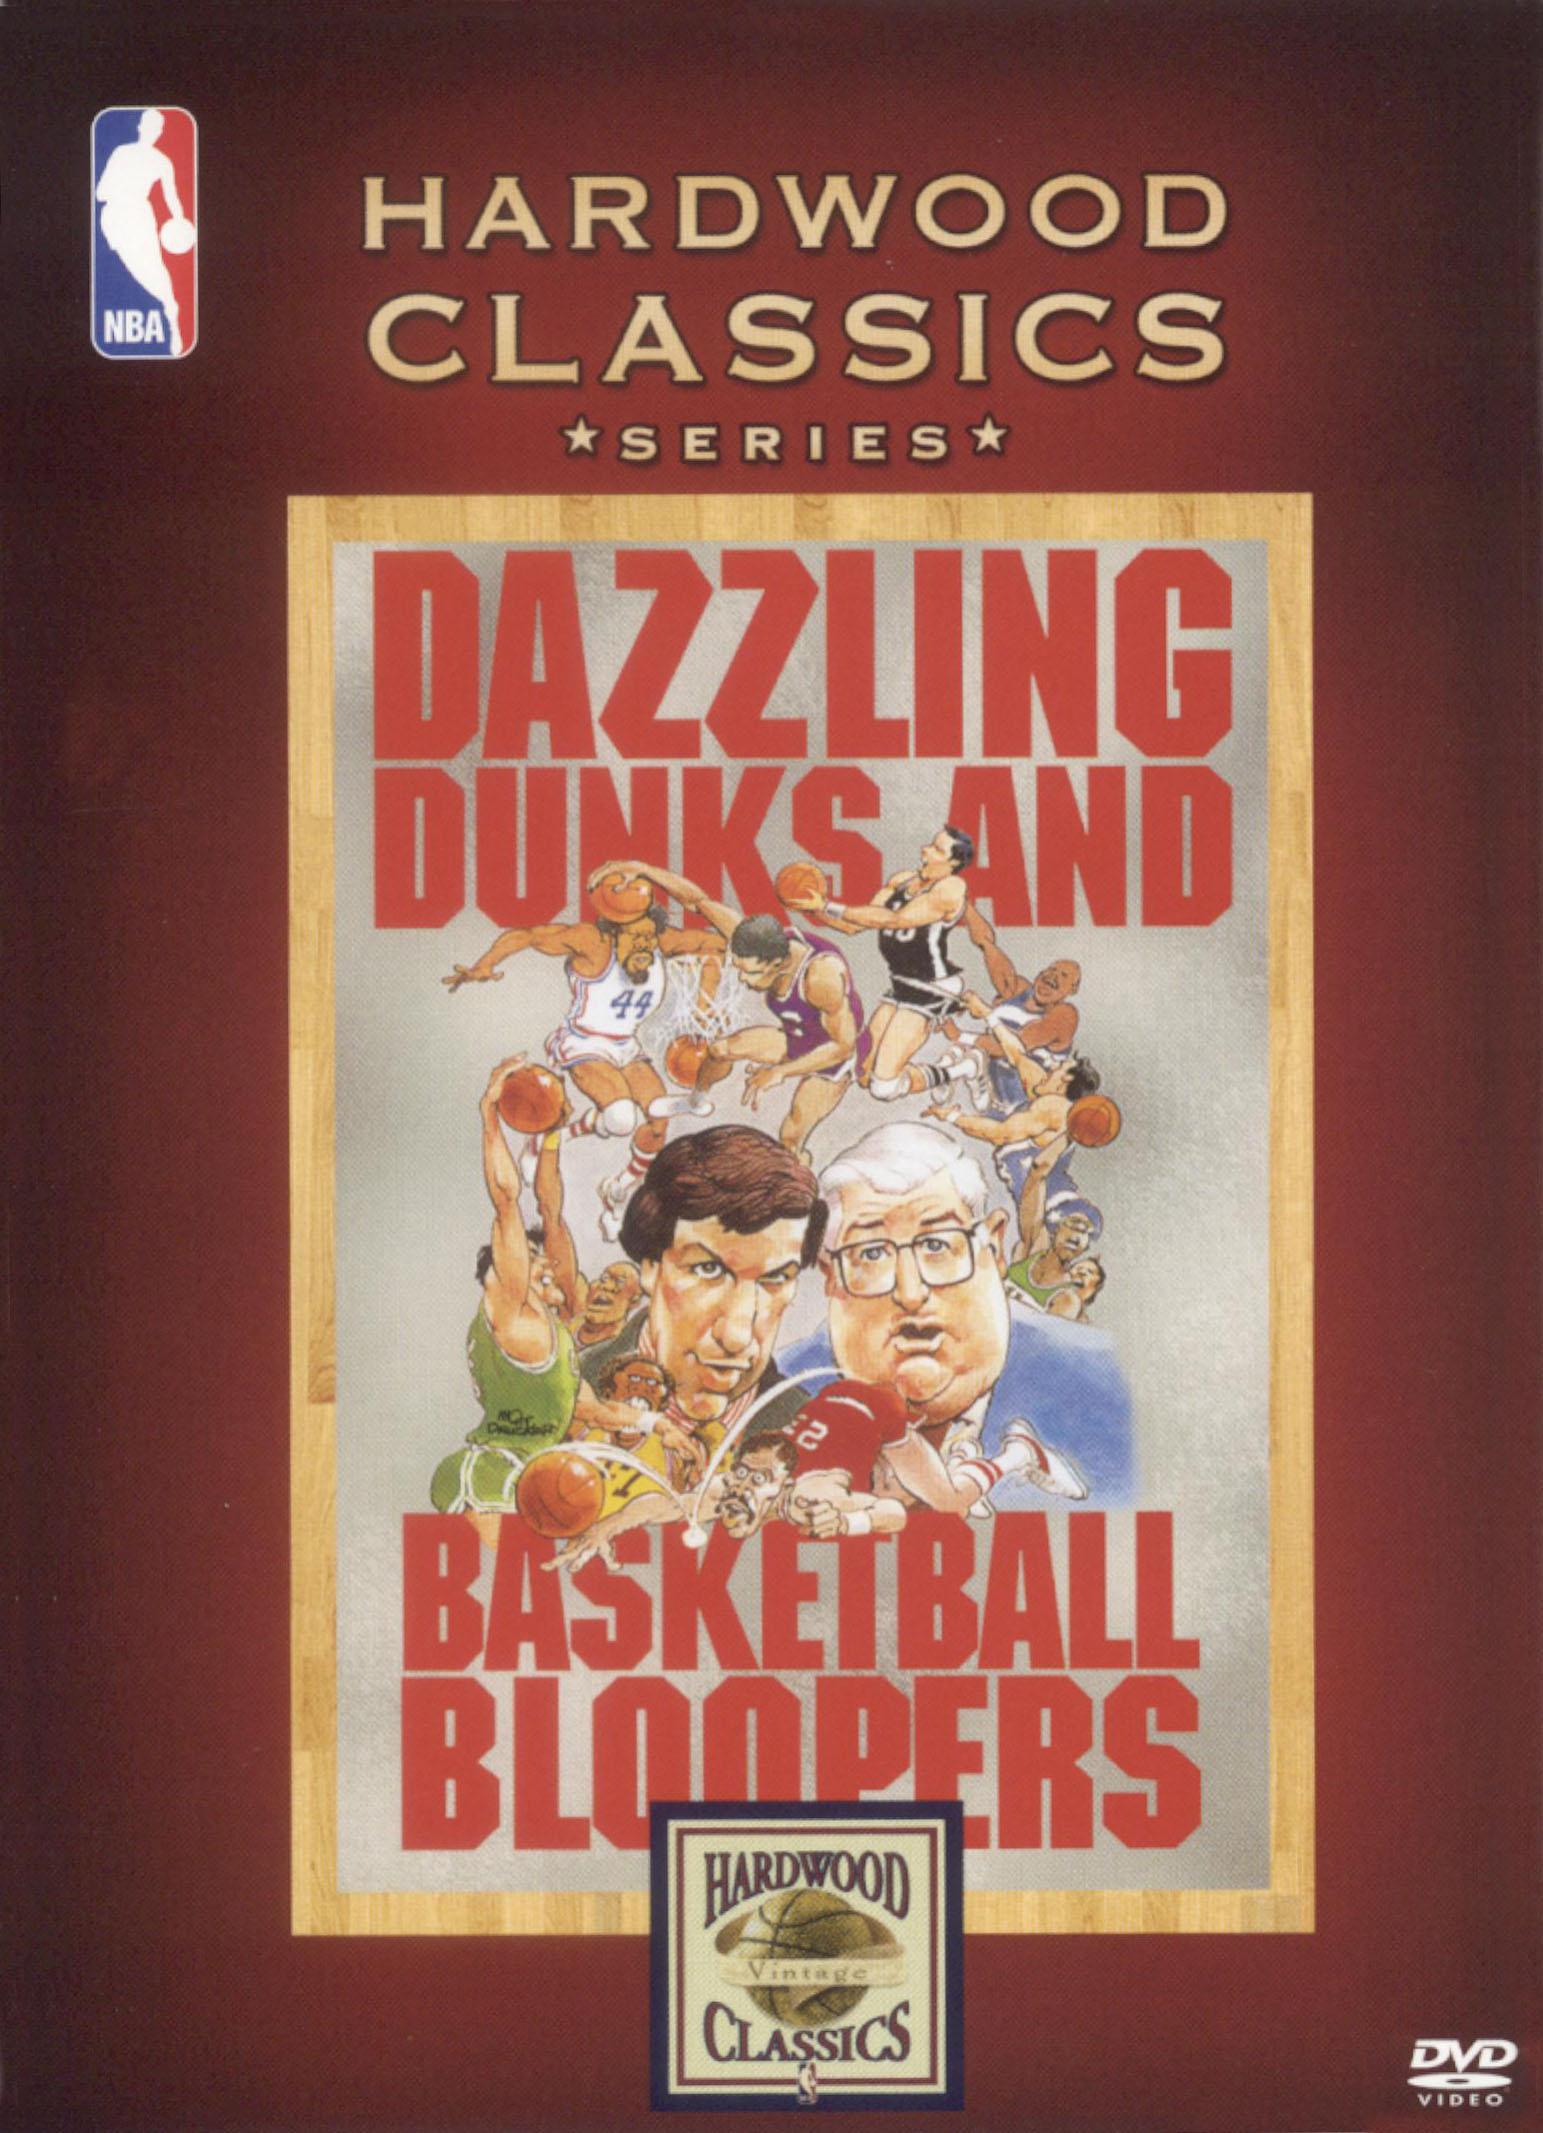 NBA: Comic Relief - The Great Blooper Caper